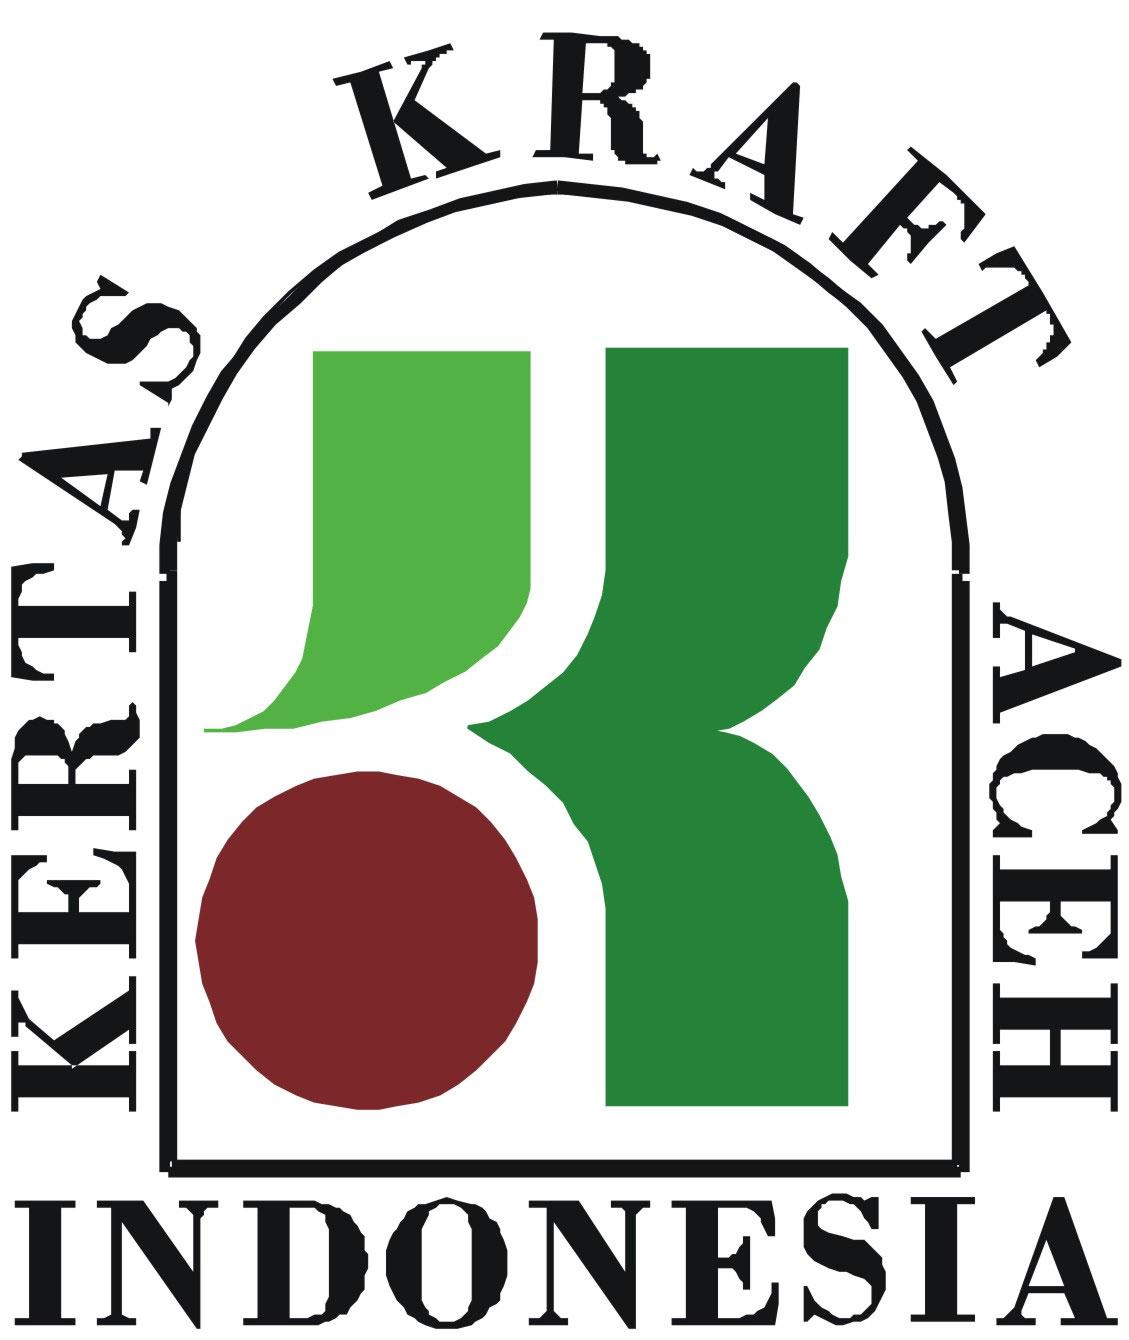 kertas kraft aceh wikipedia bahasa indonesia ensiklopedia bebas kertas kraft aceh wikipedia bahasa